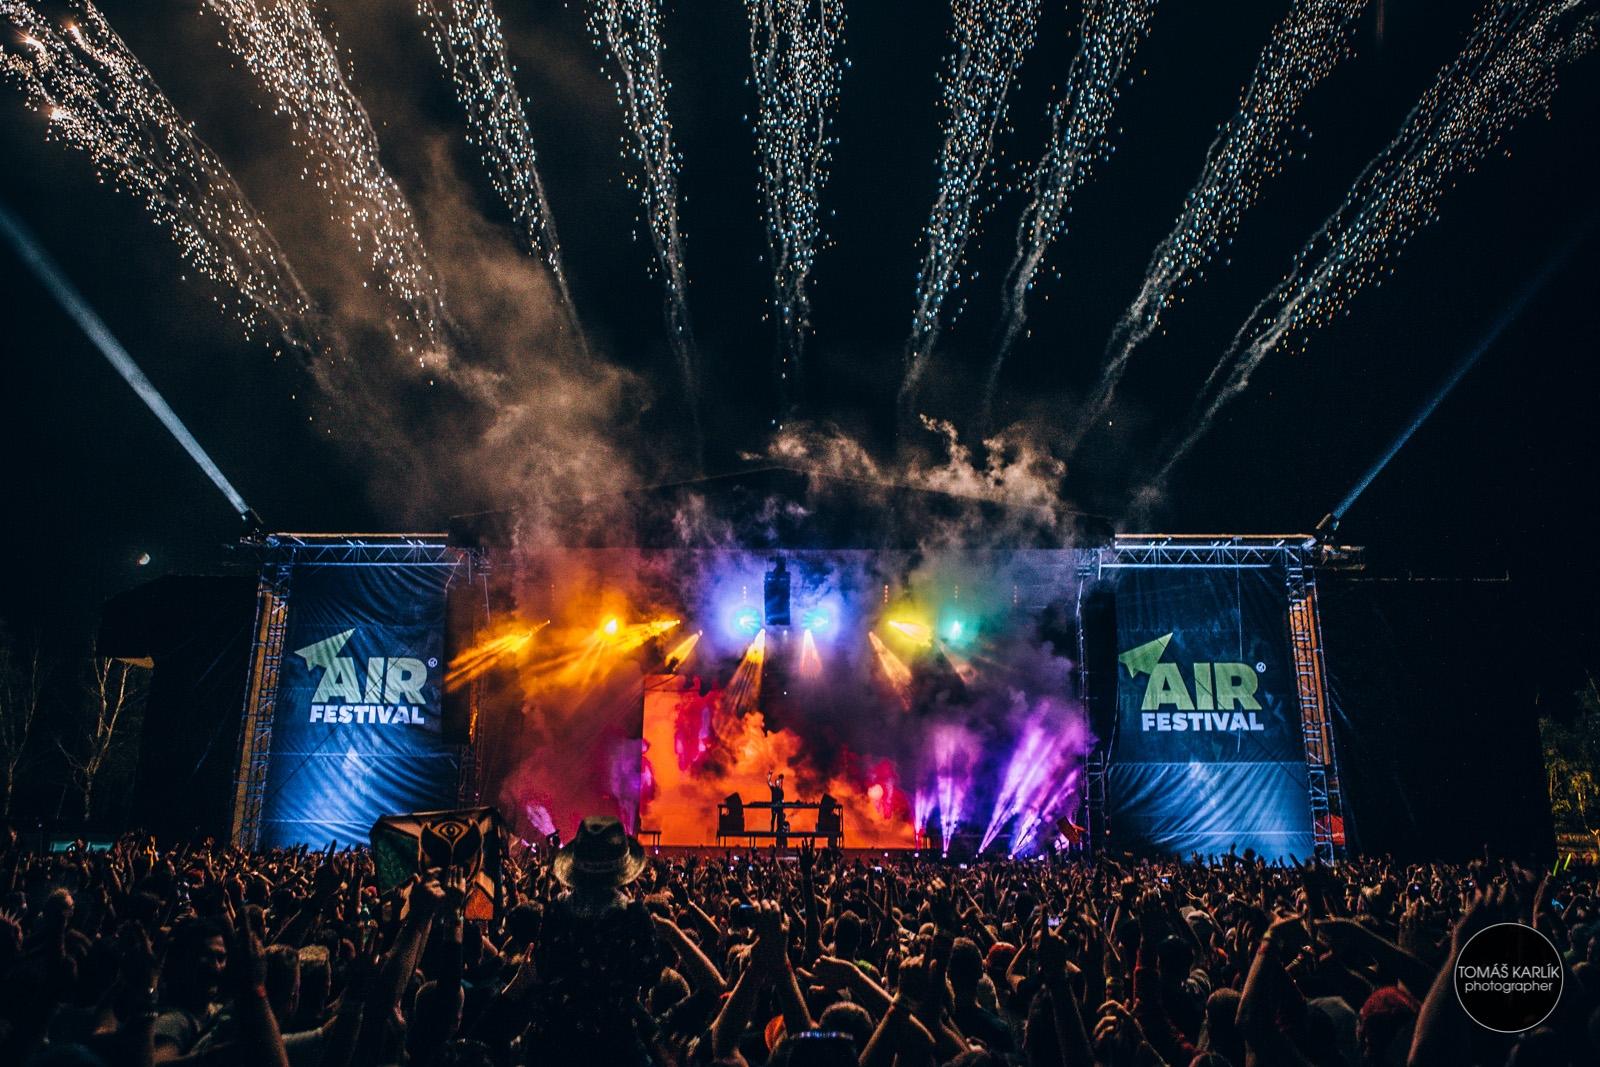 Air Festival 2017 Pandaticket Cz